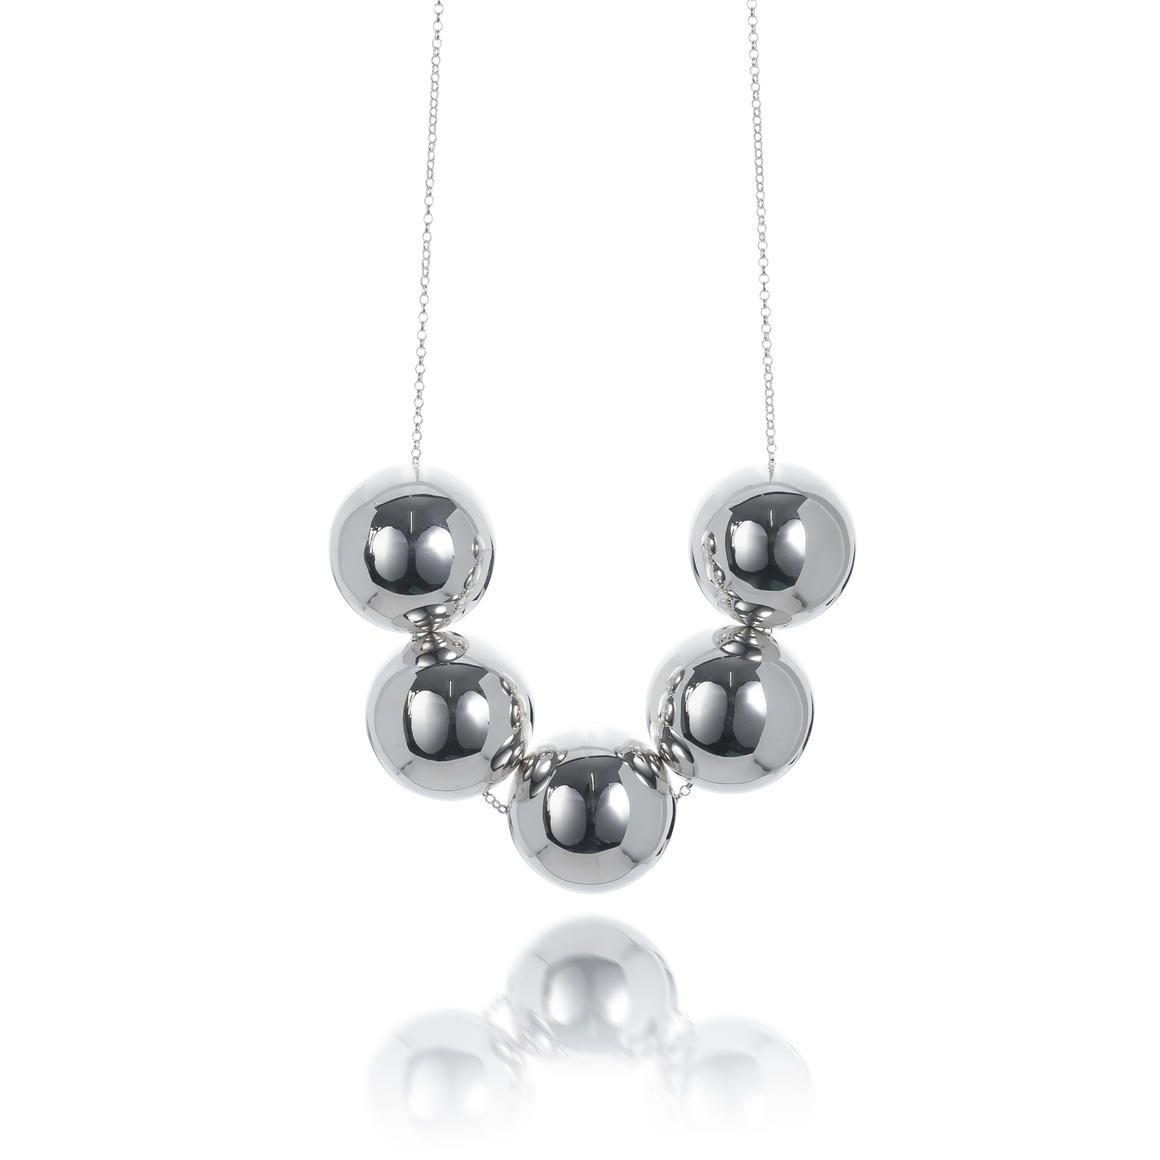 5 Ball Necklace | Trada Marketplace